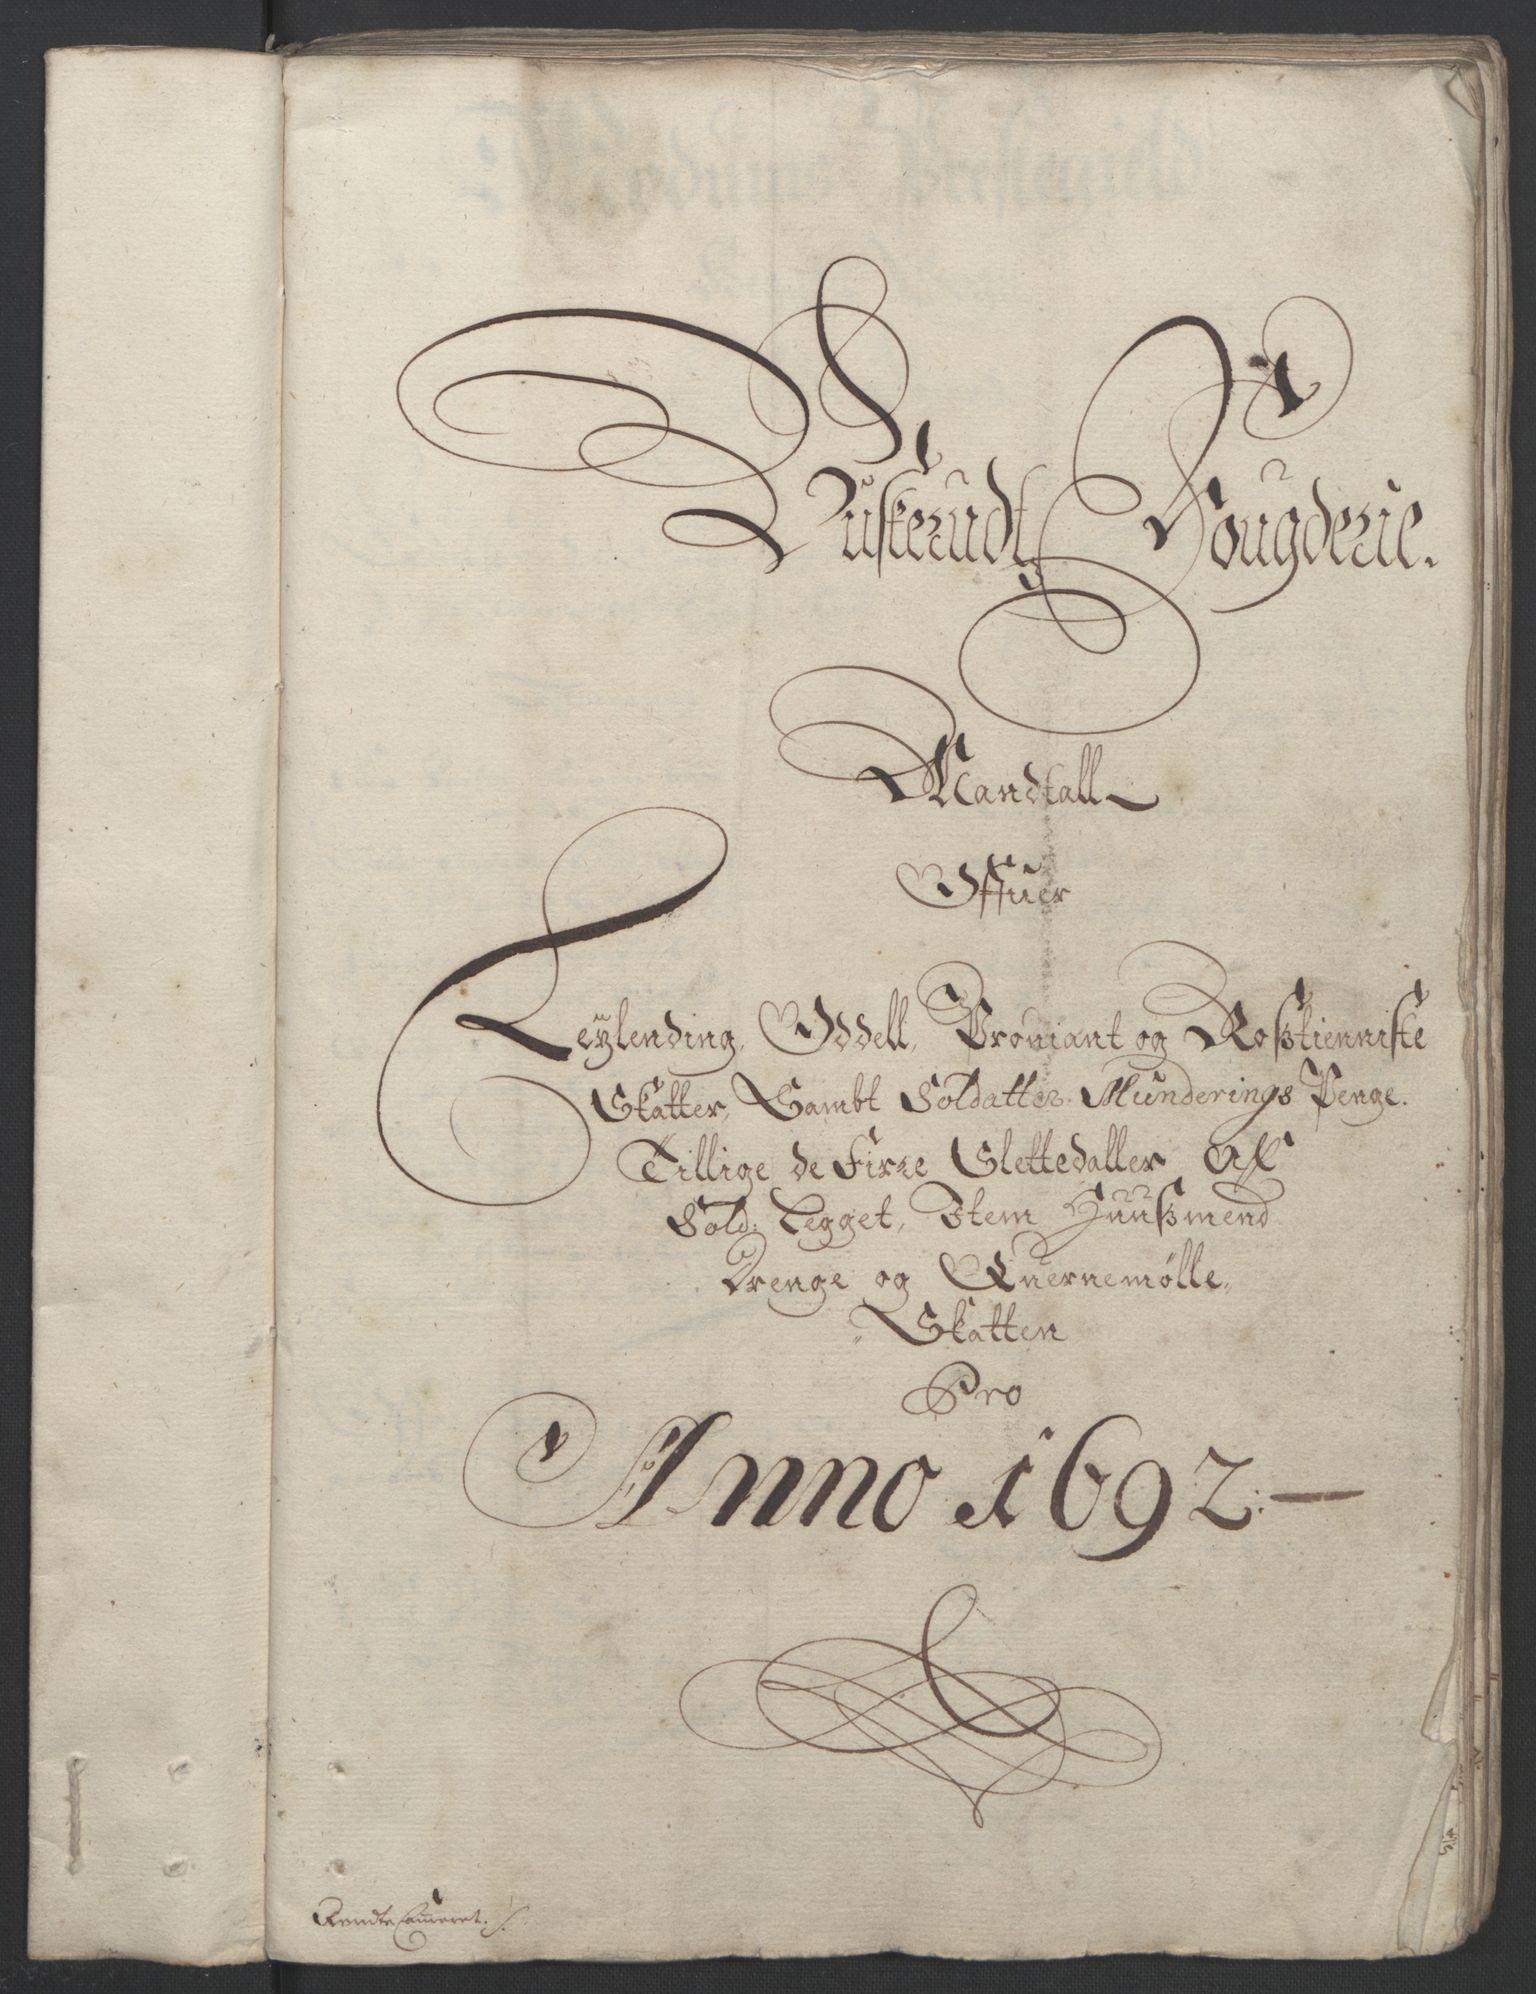 RA, Rentekammeret inntil 1814, Reviderte regnskaper, Fogderegnskap, R25/L1681: Fogderegnskap Buskerud, 1691-1692, s. 354